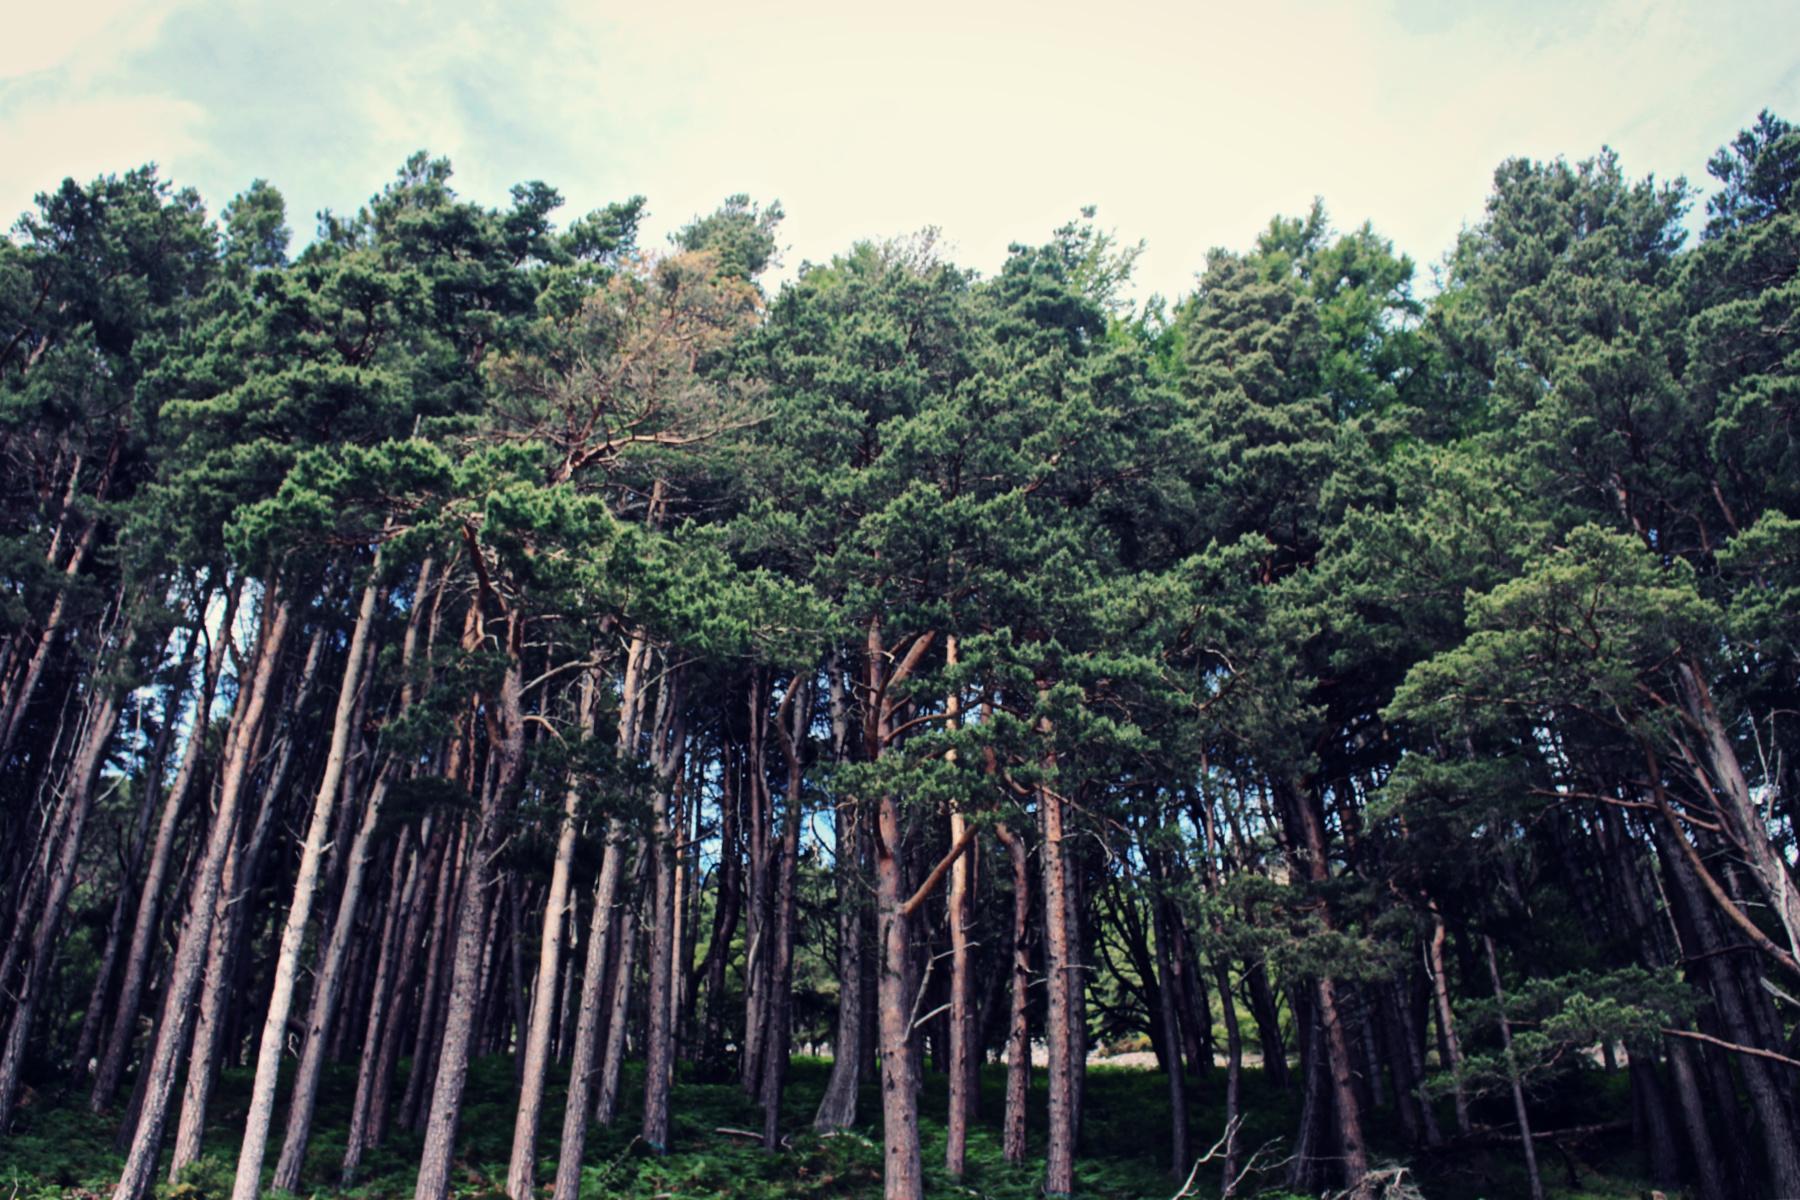 Trees Loch Ness-6b20f0b9